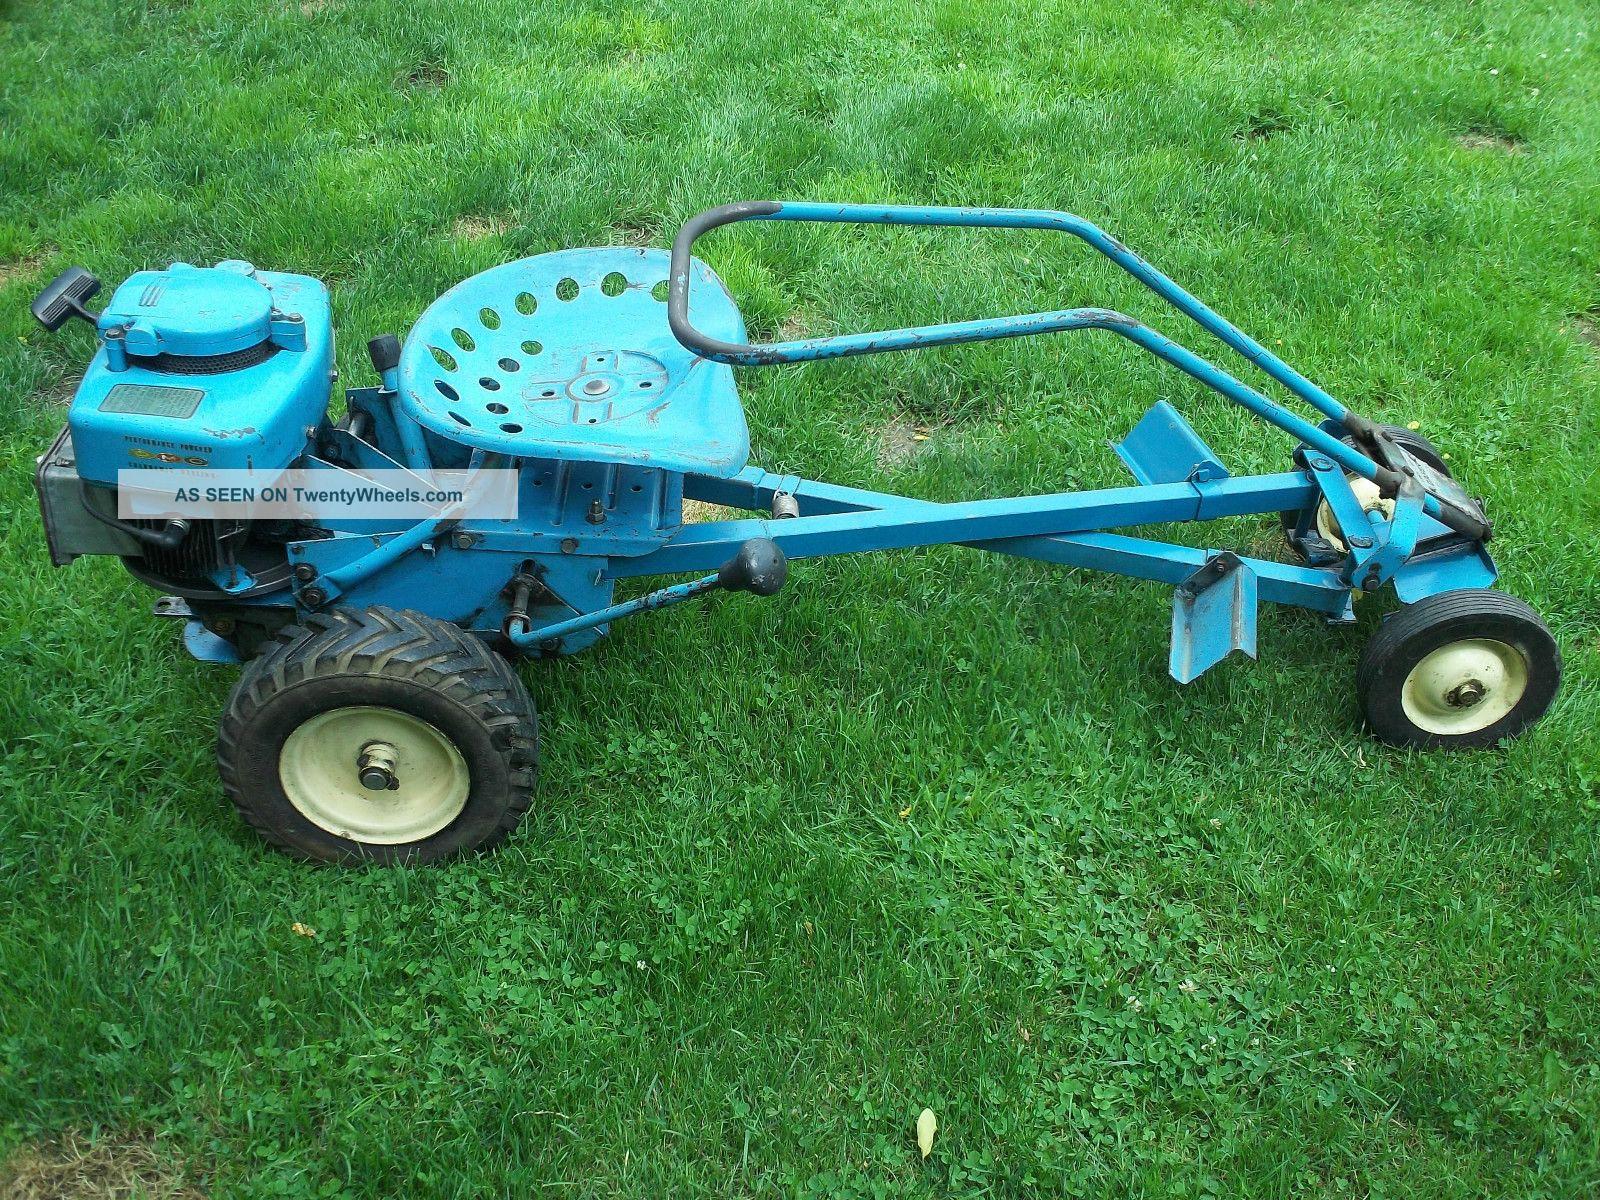 Riding Lawn Mower Tractor : Blue riding lawn mowers creativity pixelmari